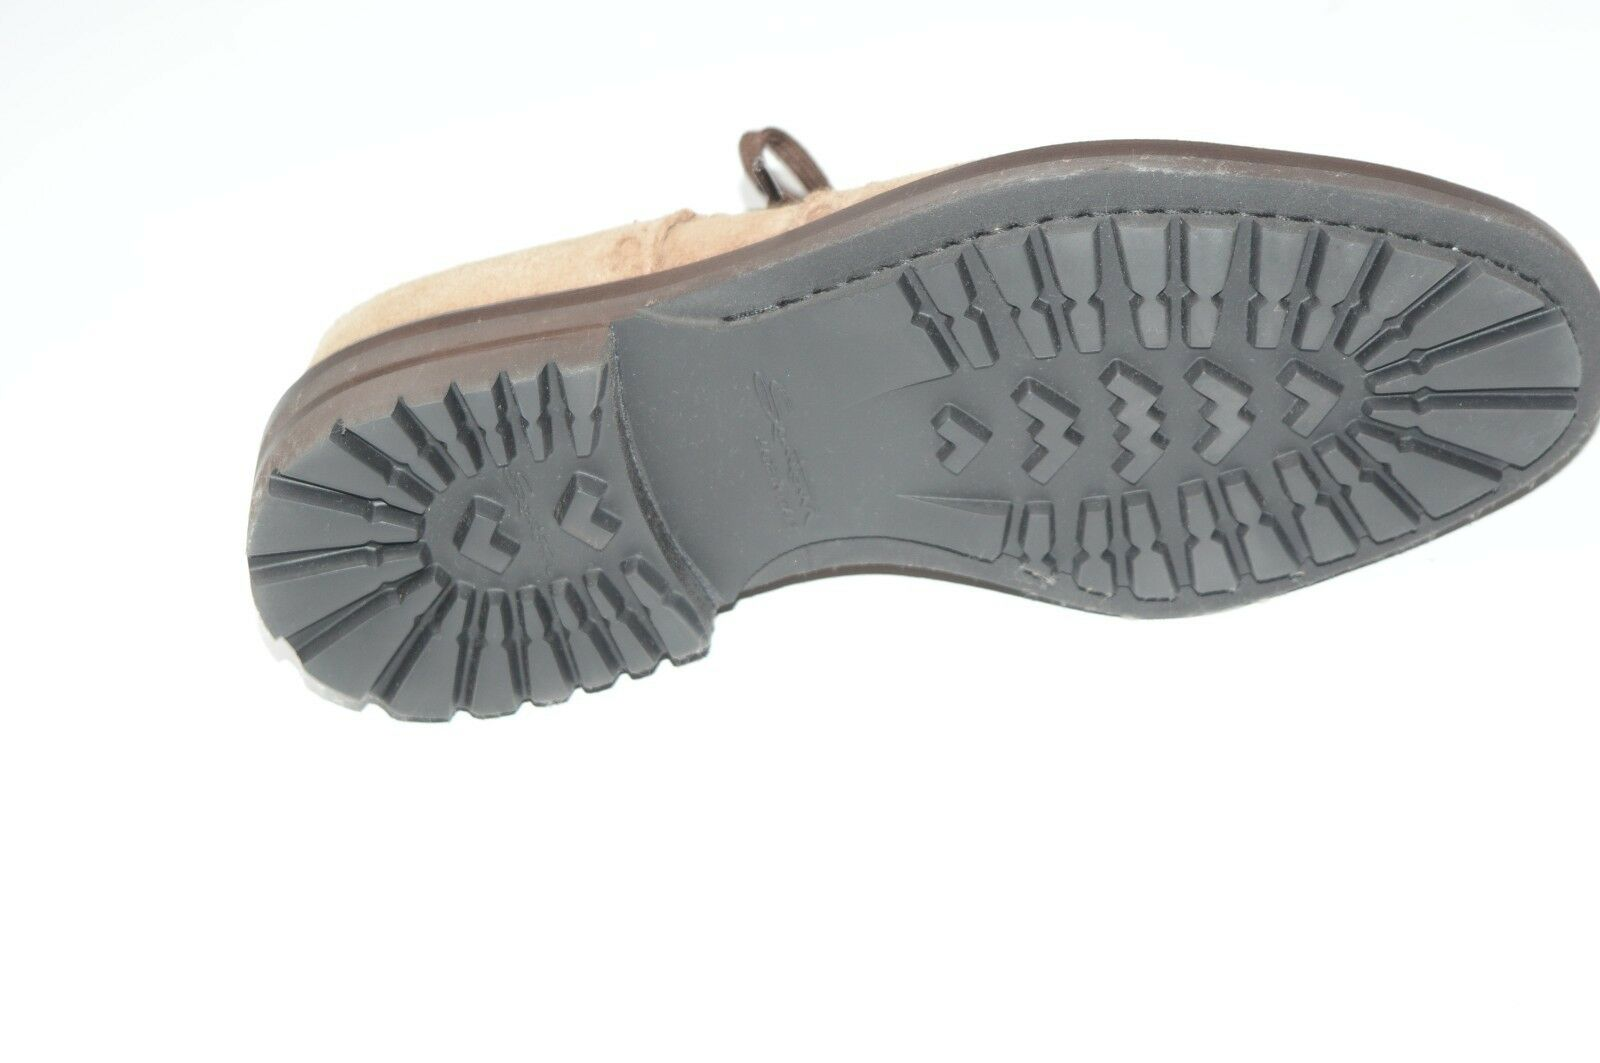 NEW SANTONI Leather Dress schuhe Größe Eu 42 Uk 8 8 8 Us 9 (NE10) fecf89